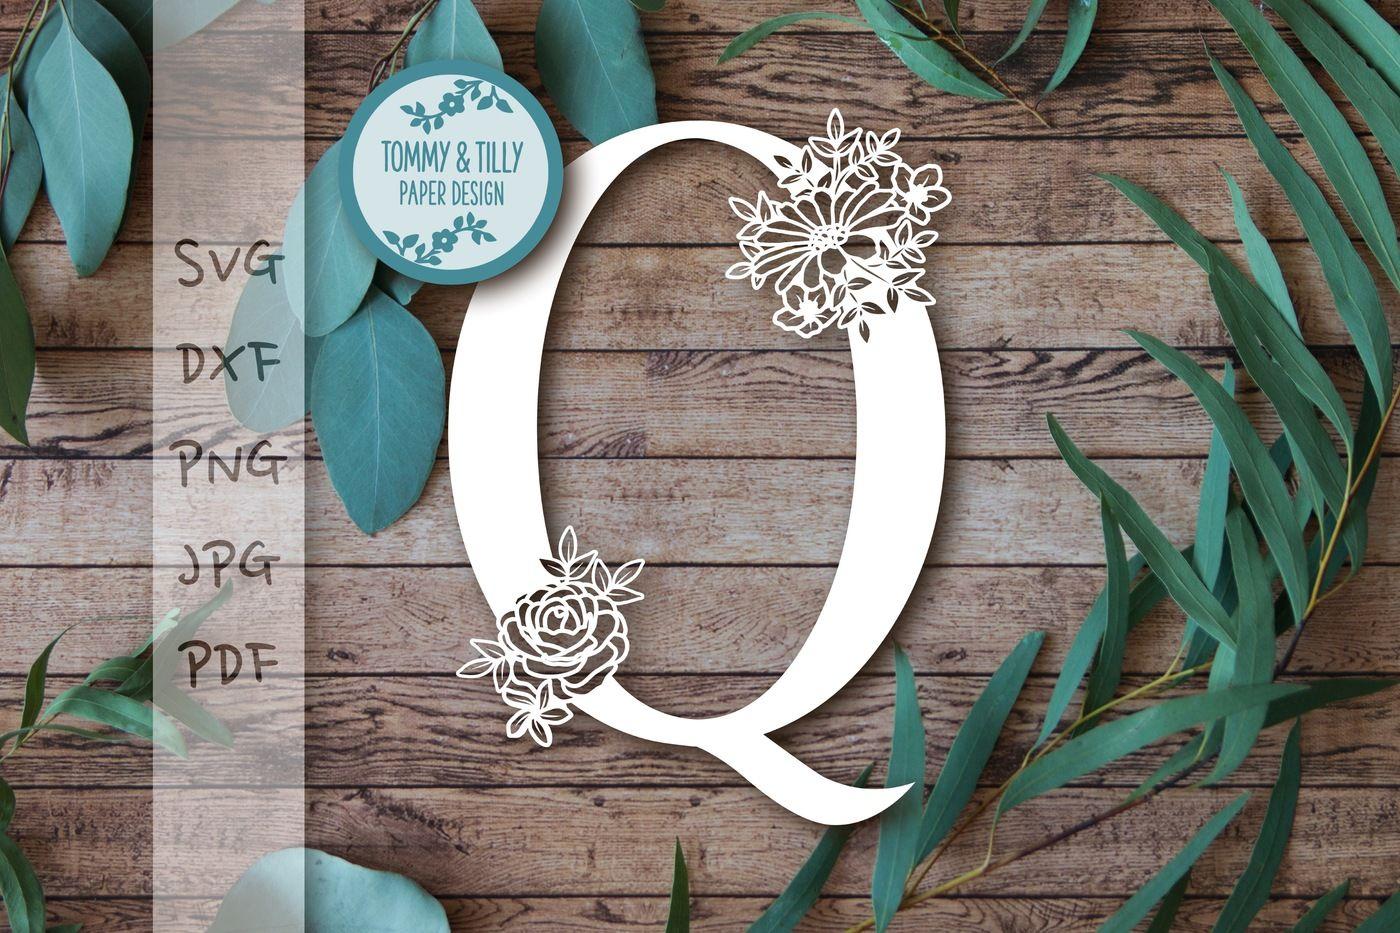 Q Floral Letter Svg Dxf Png Pdf Jpg By Tommy And Tilly Design